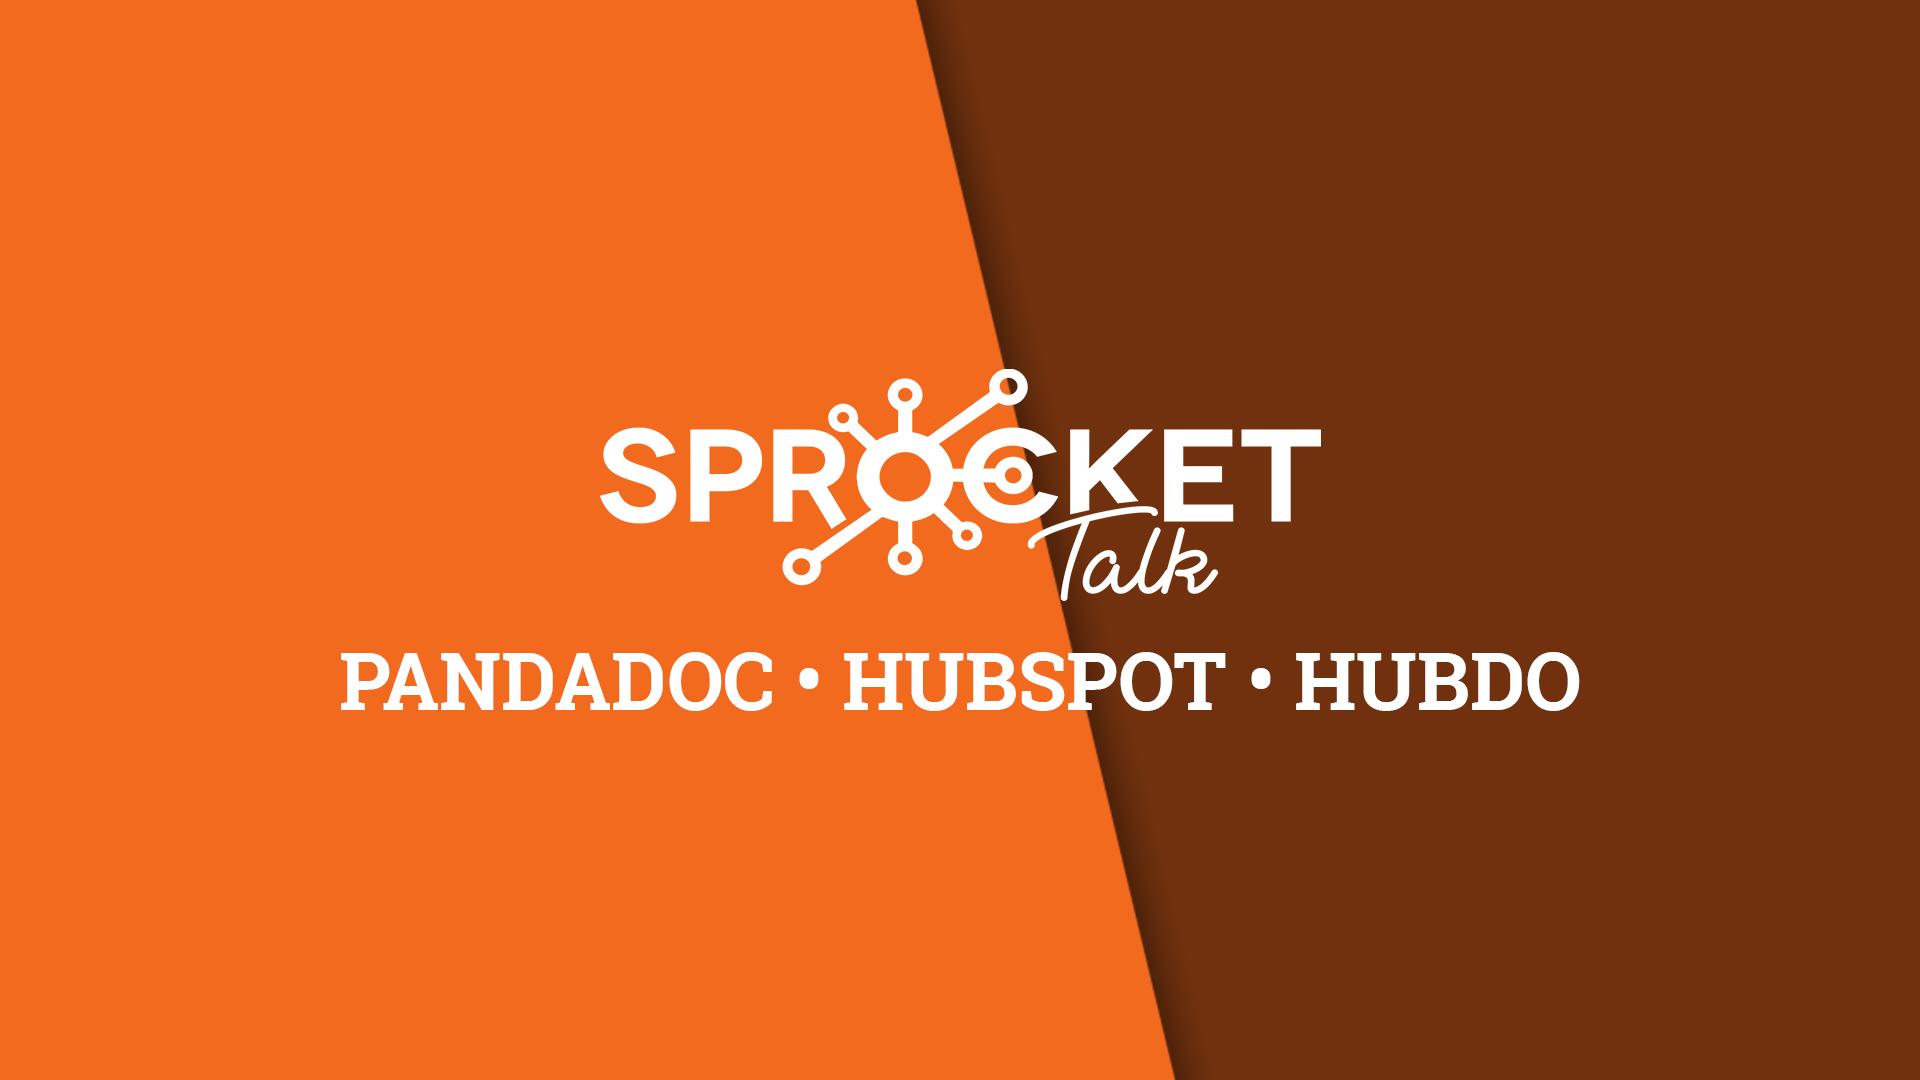 HubDo, PandaDoc, and HubSpot to Streamline Your Digital Document Process